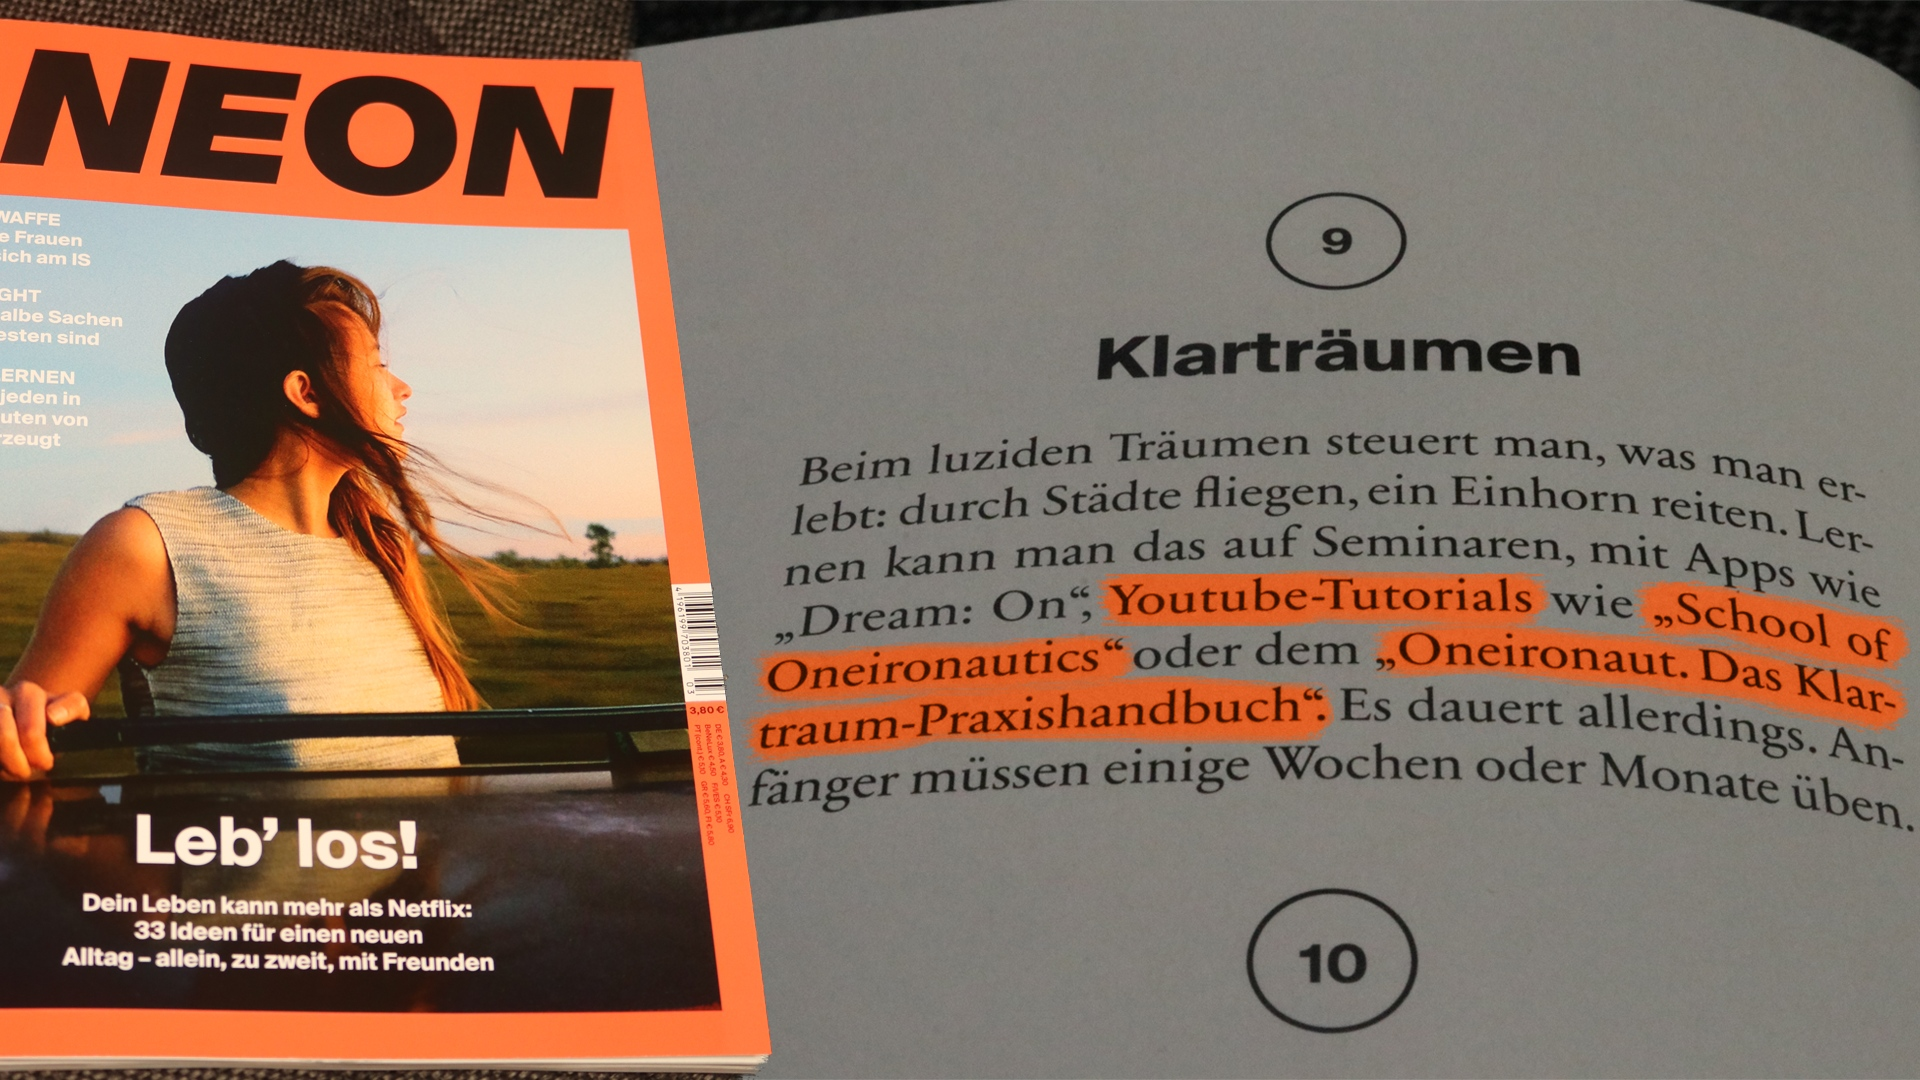 NEON_school_of_oneironautics_oneironaut_das_klartraumpraxishandbuch